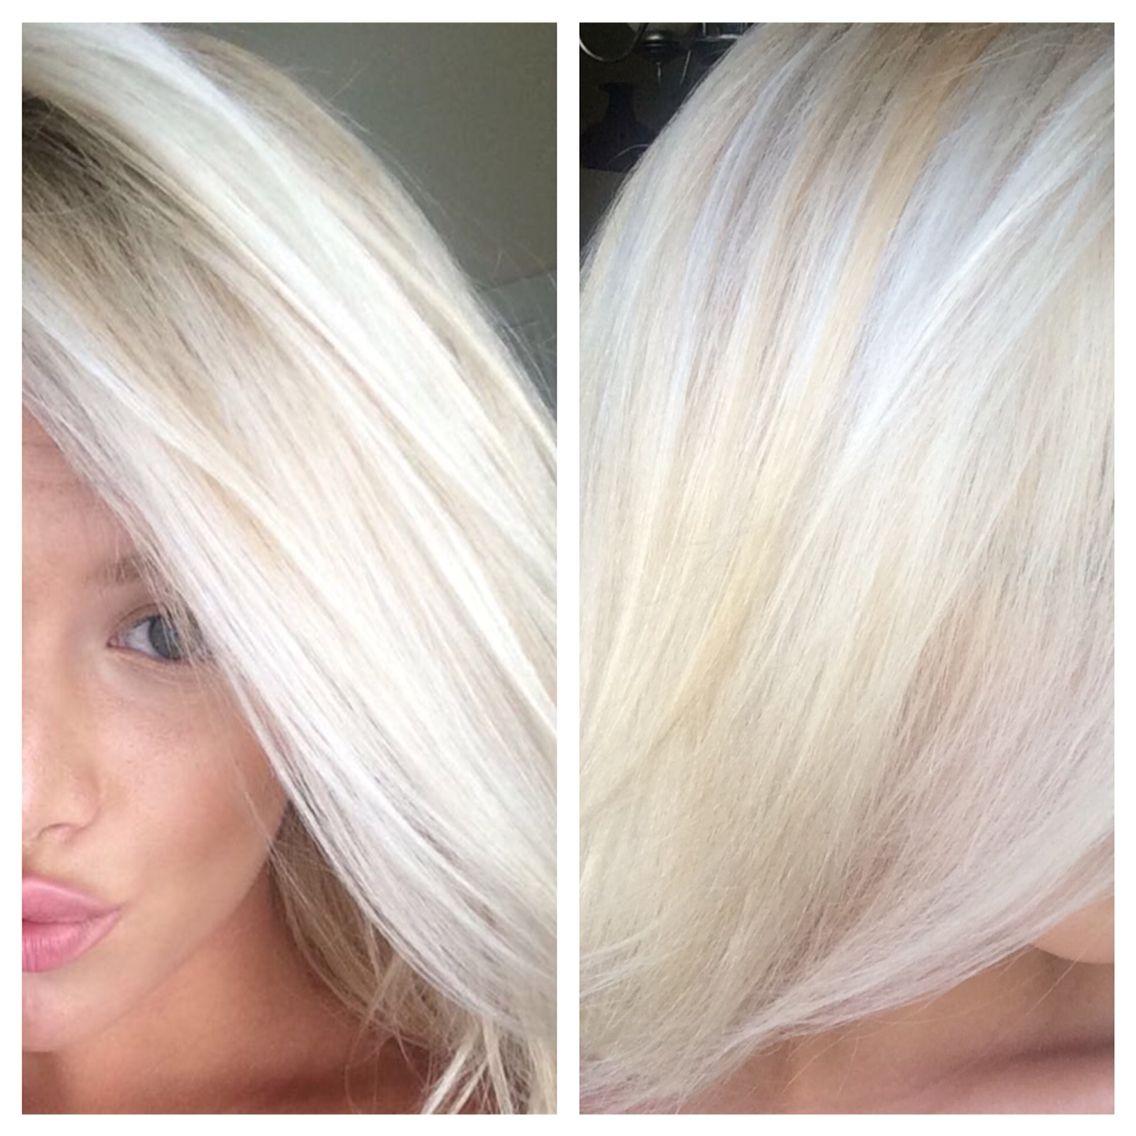 Healthy pearl blonde by Partners Hair Studio in Tampa, Florida. 13115 W. Linebaugh Ave. Unit 101 Tampa, FL 33626. www.partnershairstudio.net